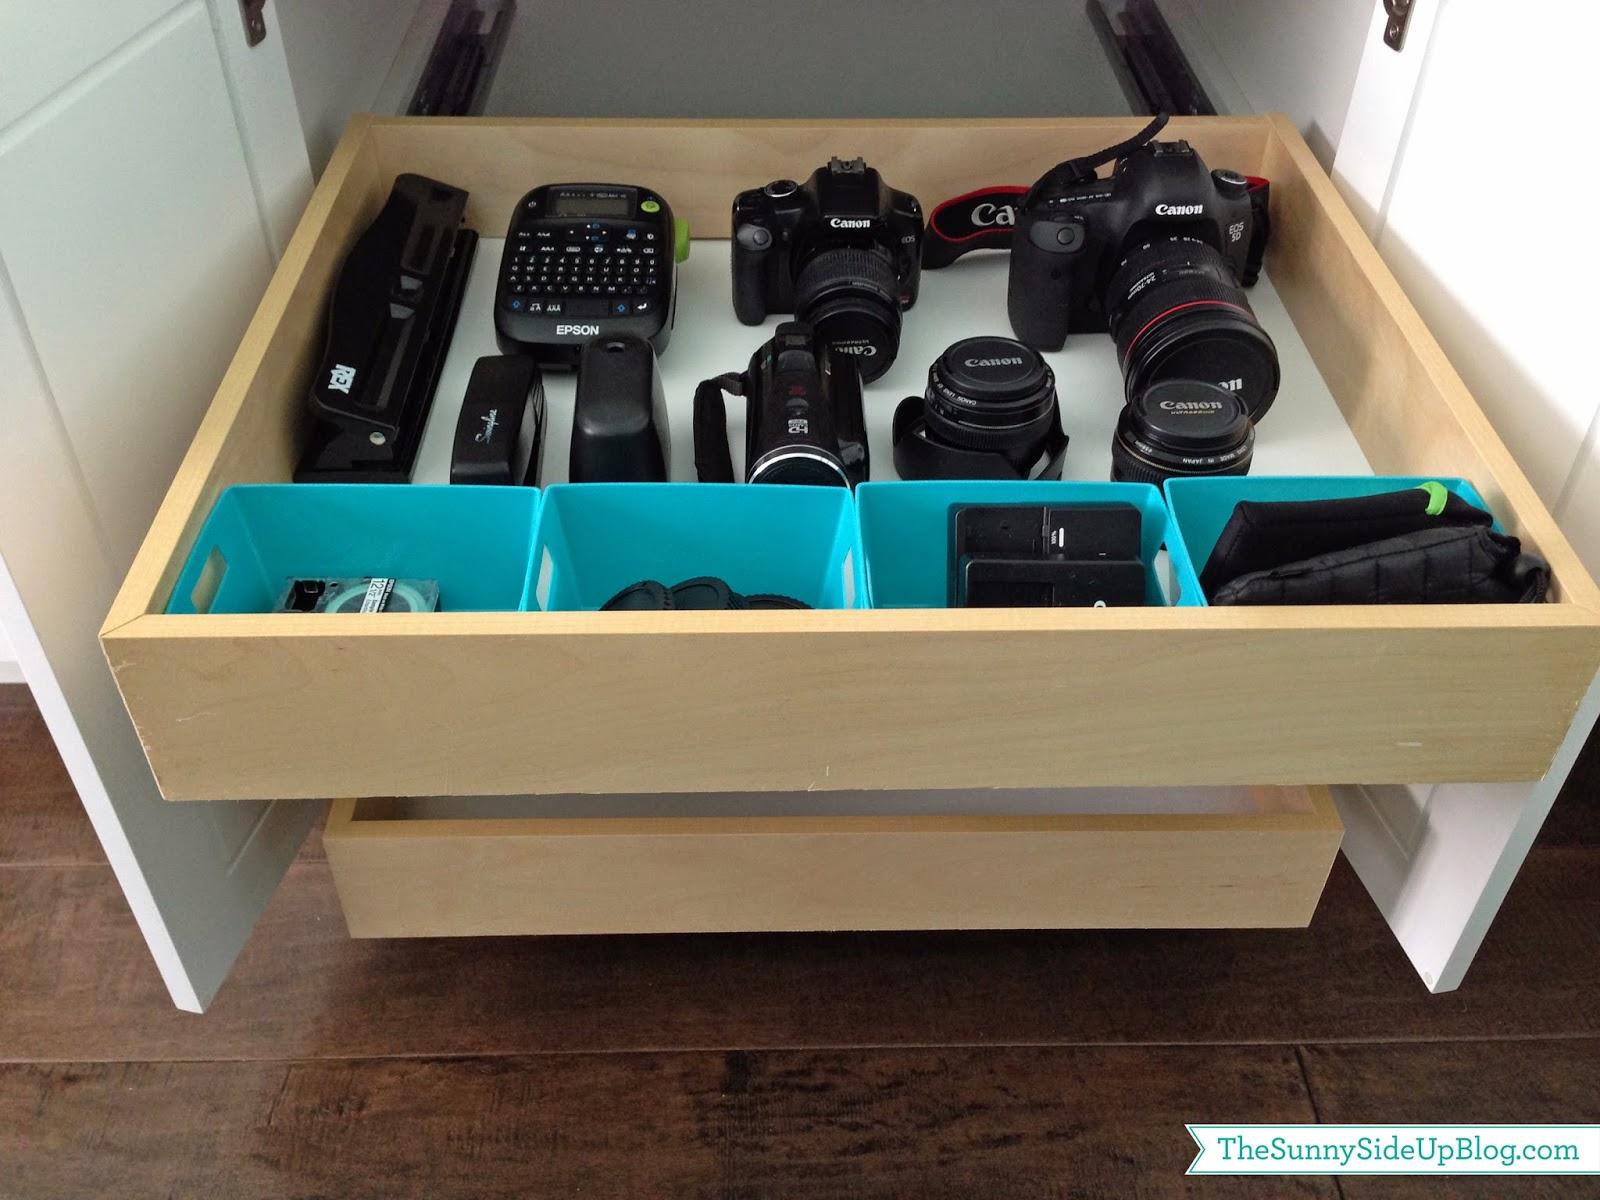 Organizing Camera Equipment - The Sunny Side Up Blog